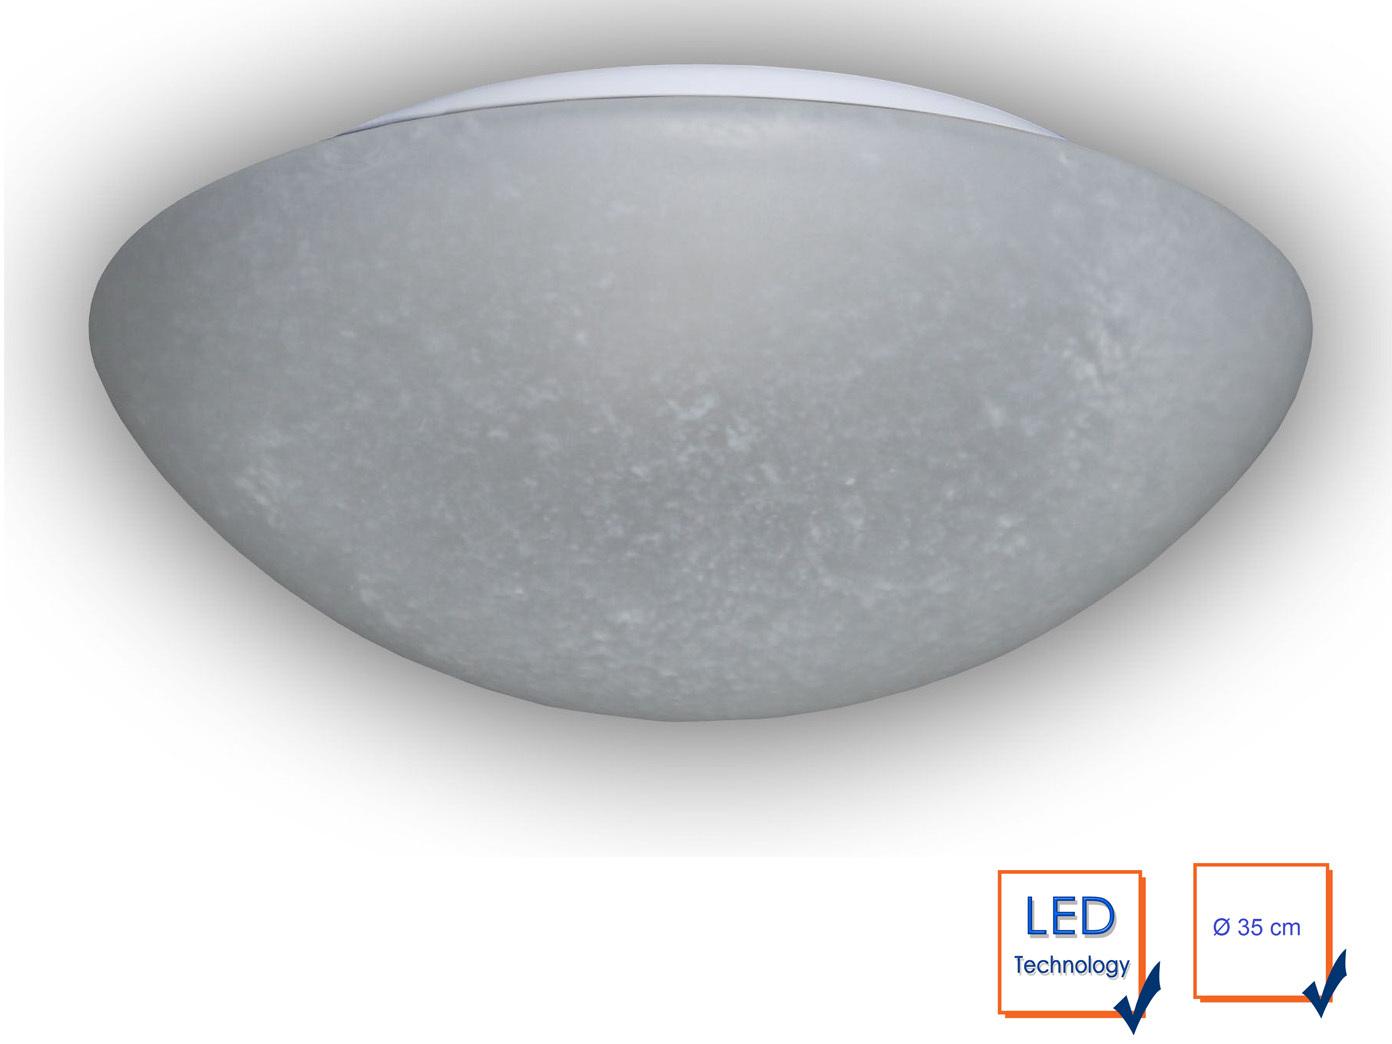 Led Deckenleuchte Rund Pergament Glas O 35cm Kuchenlampe Neu Led